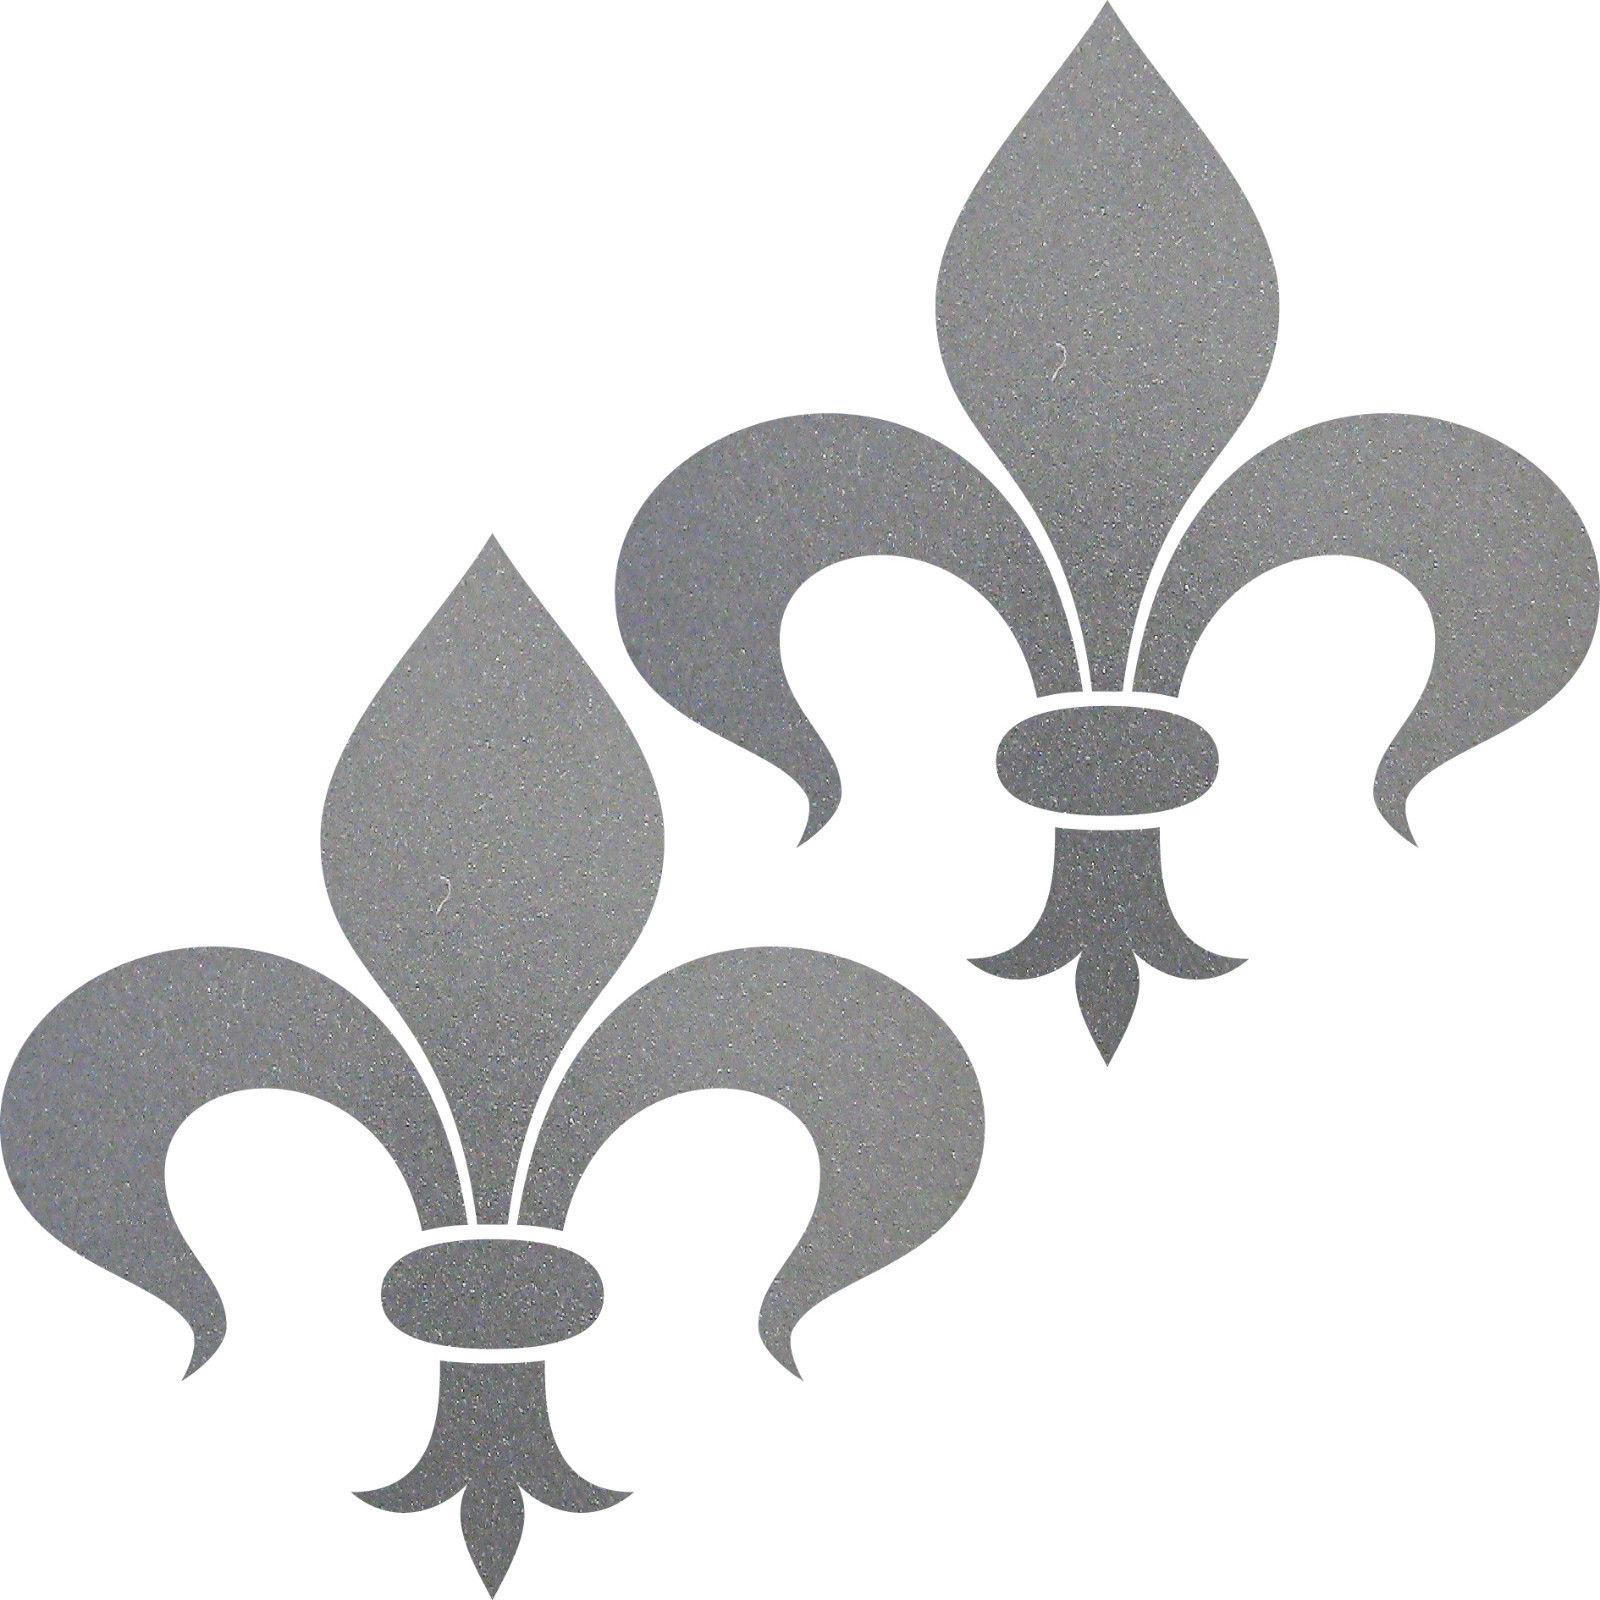 2 aufkleber tattoo florenz lilie 8cm silber fleur de lis deko folie klebefolie kaufen bei green it. Black Bedroom Furniture Sets. Home Design Ideas